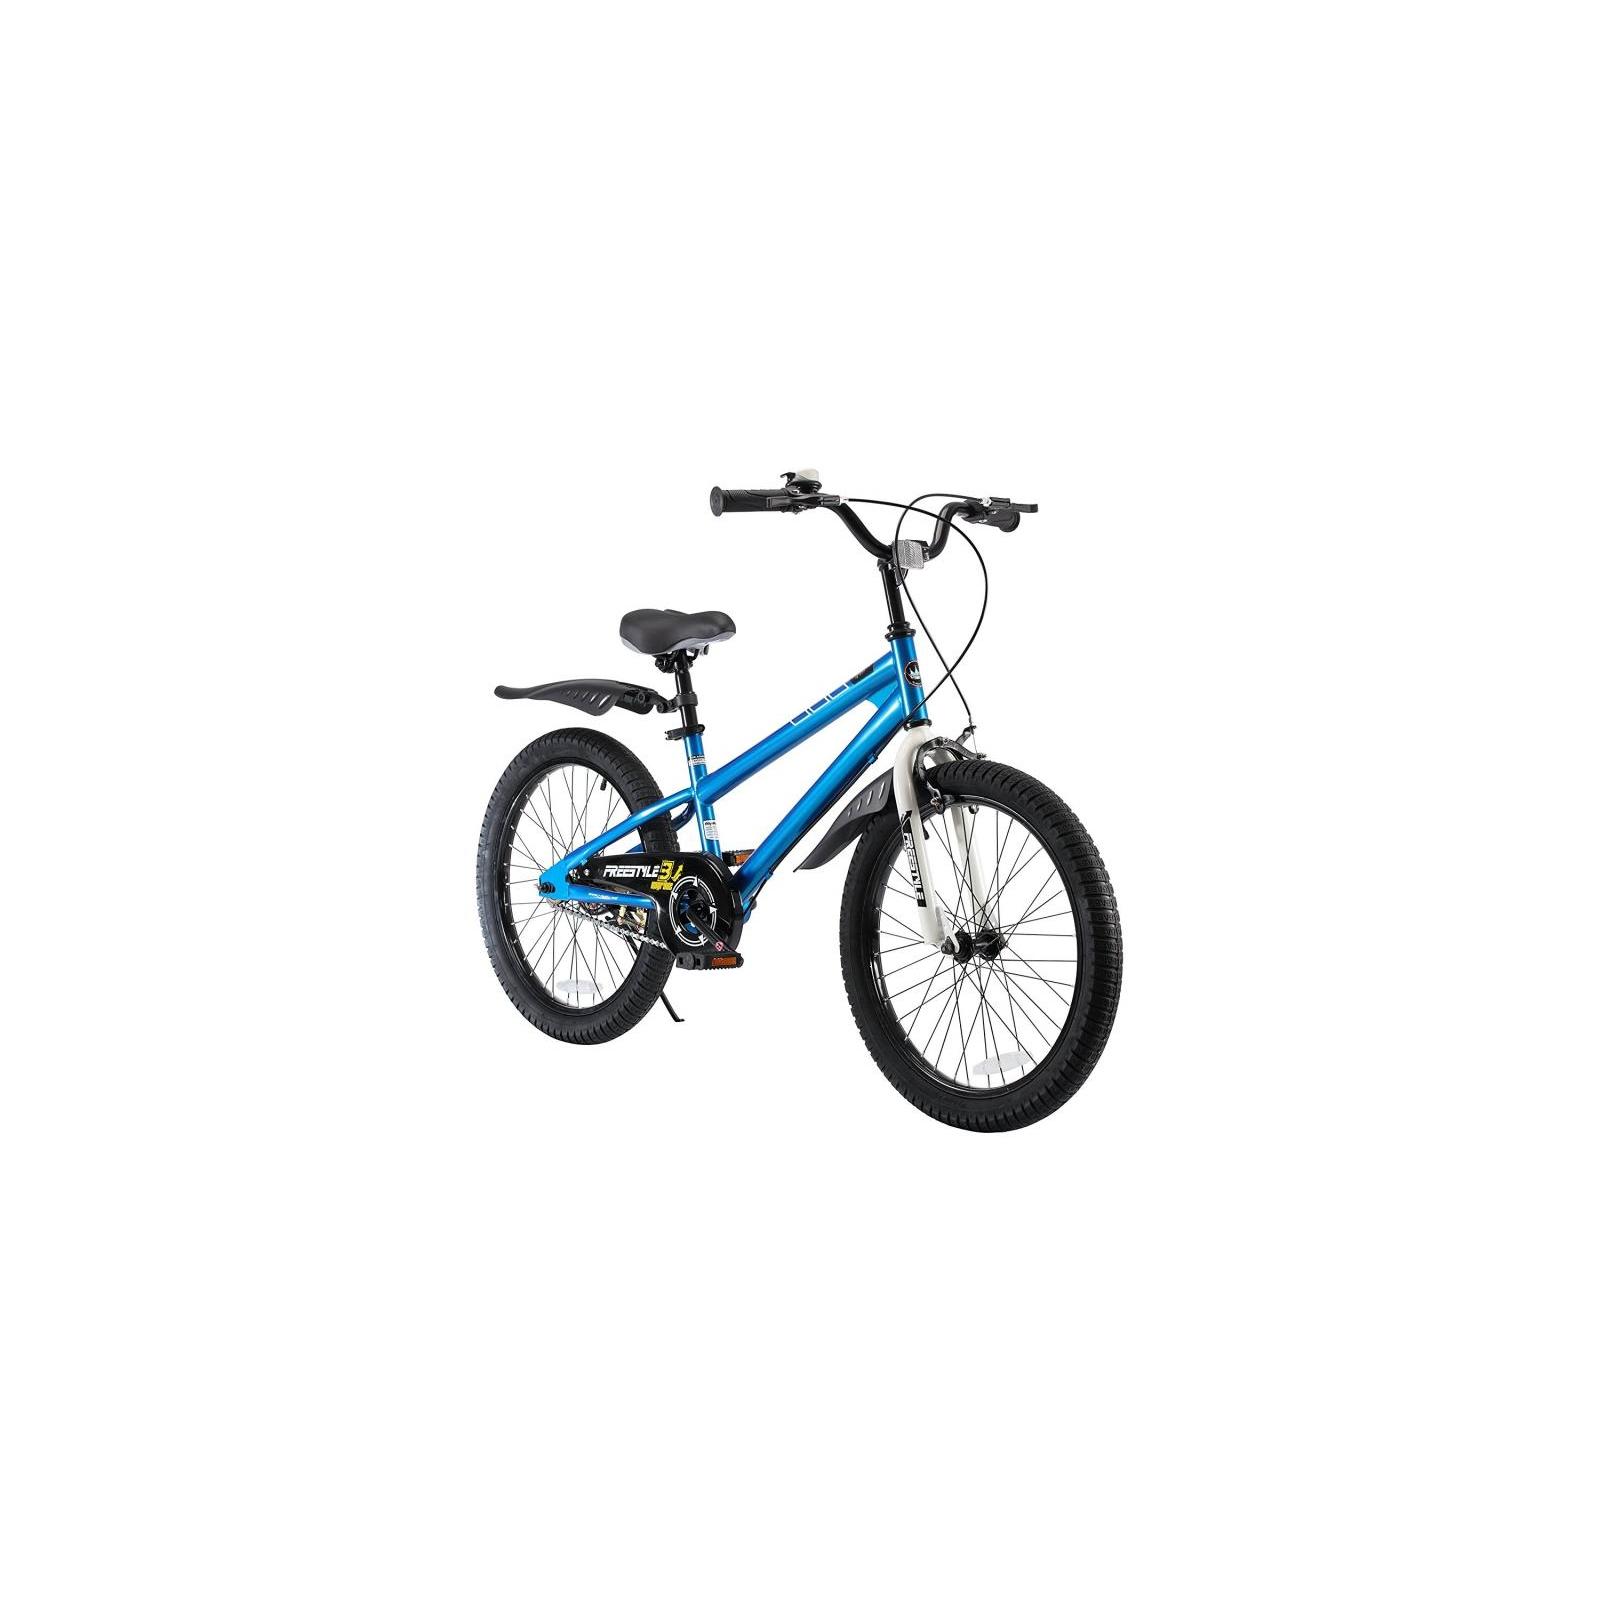 "Велосипед Royal Baby FREESTYLE 20"", синий (RB20B-6-BLU) изображение 3"